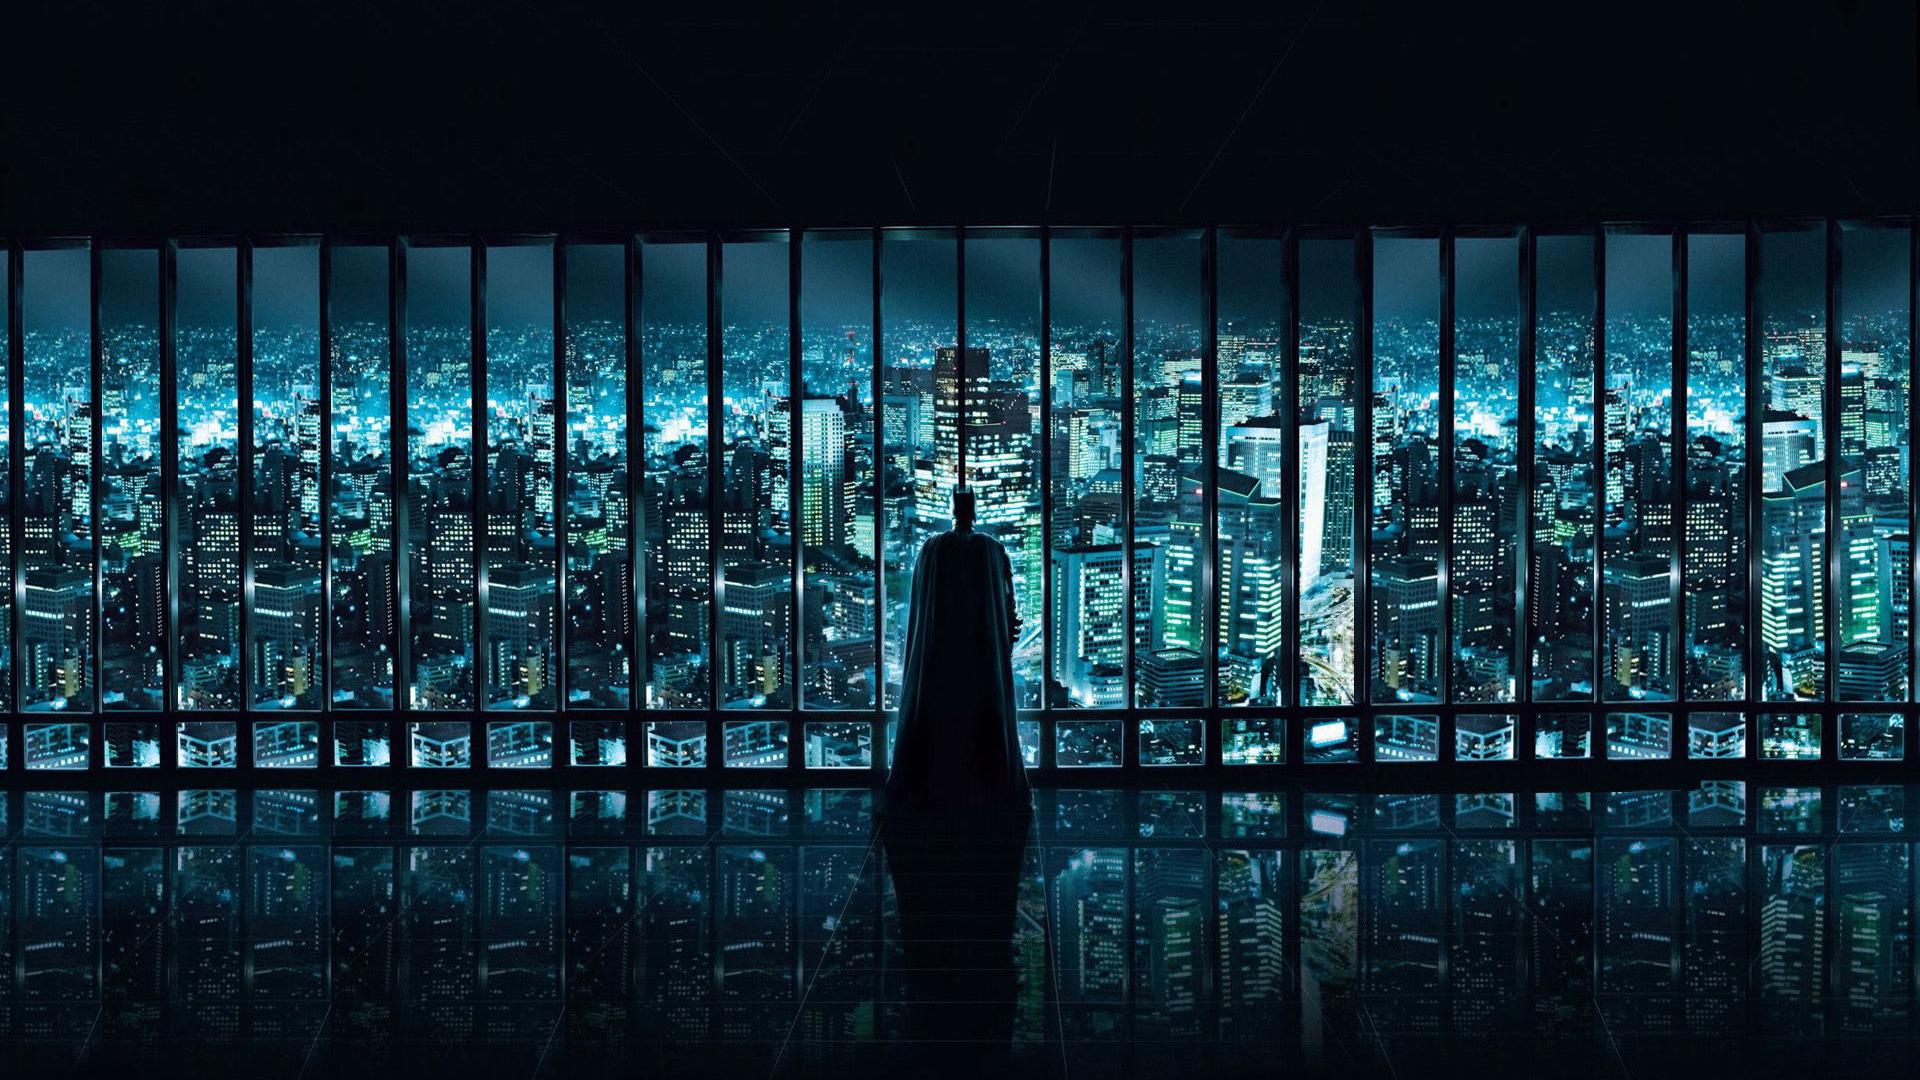 batman-watching-over-gotham-city-movie-wallpaper-3633.jpg